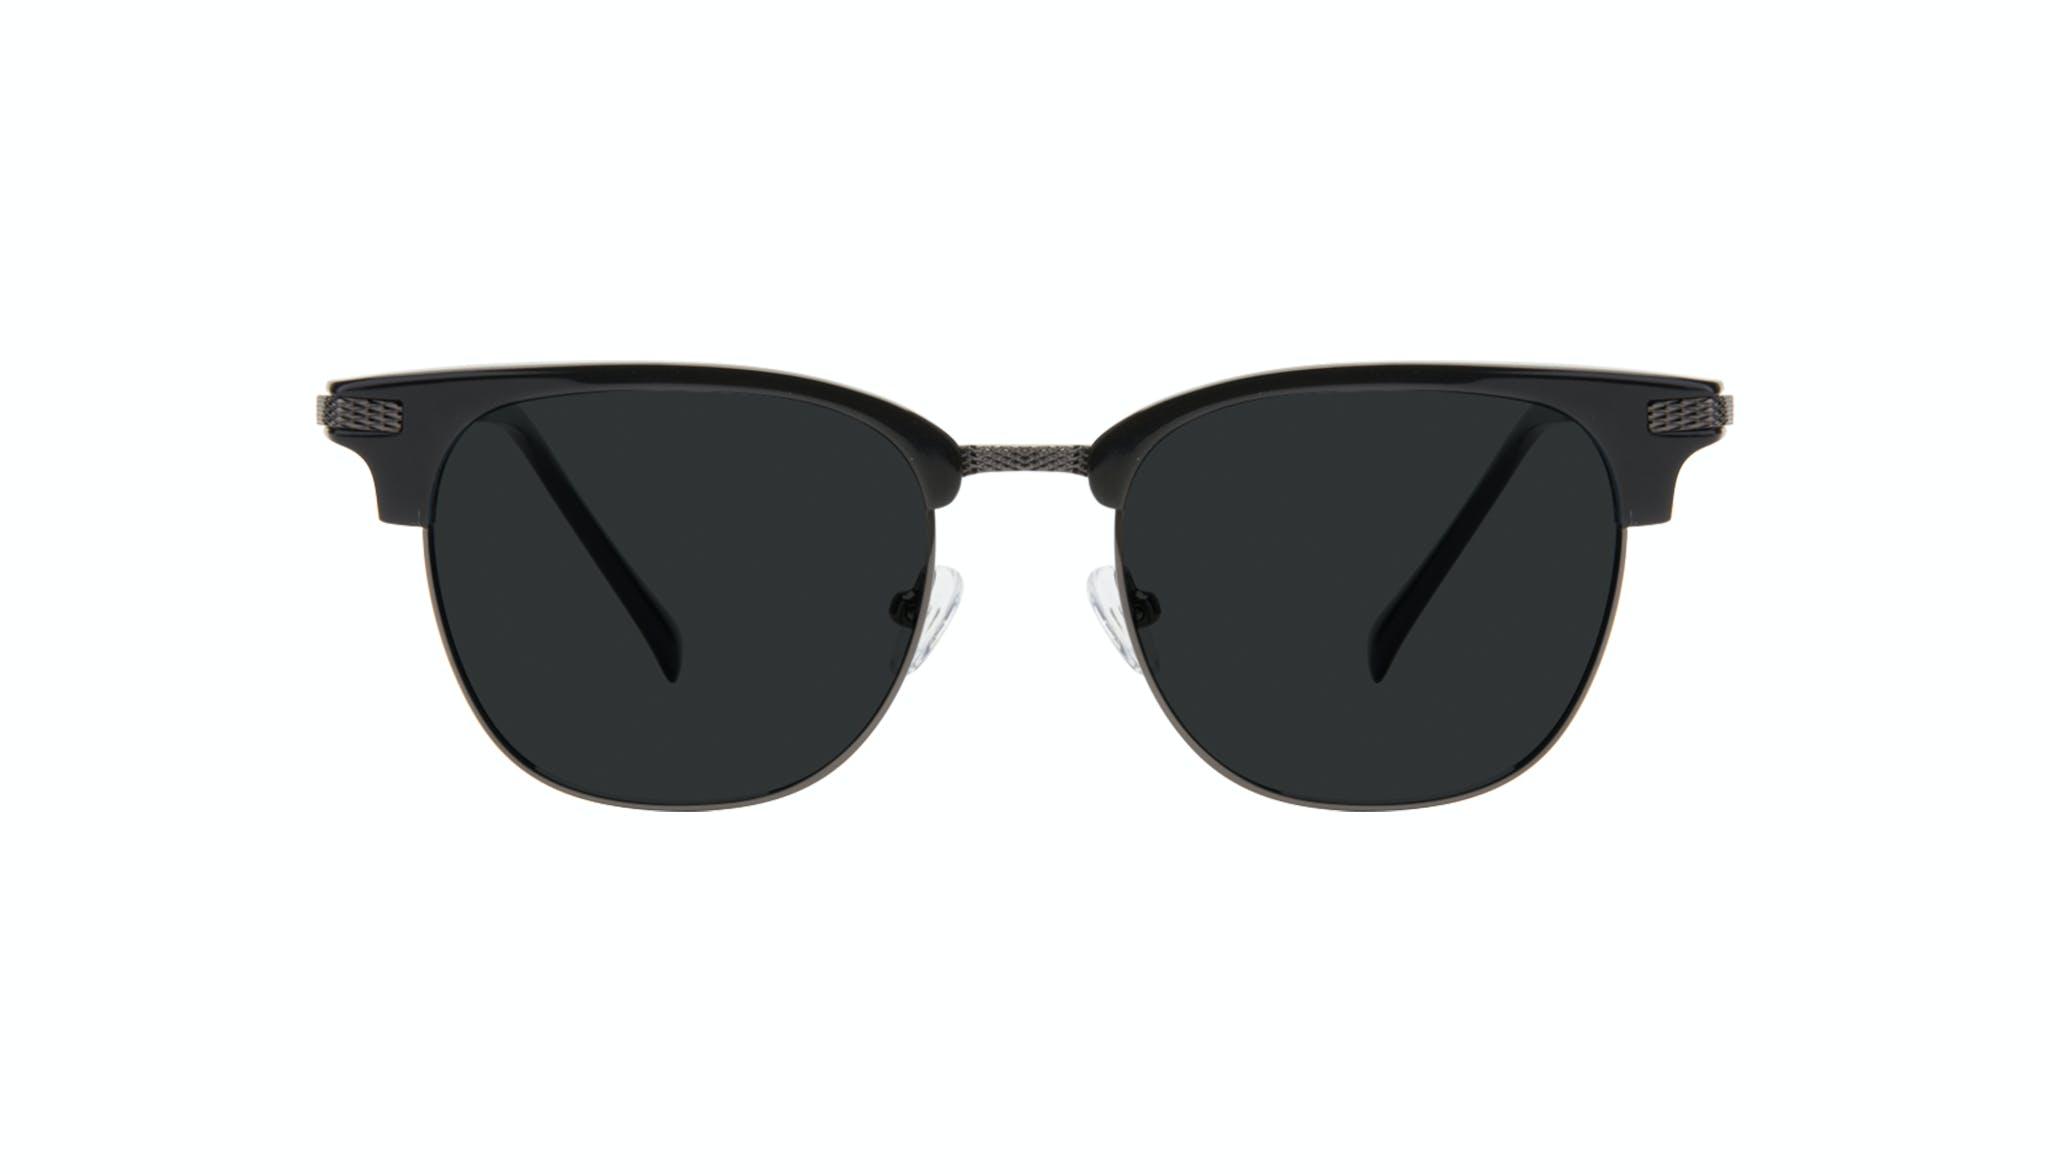 Affordable Fashion Glasses Square Sunglasses Men Blacktie Onyx Front